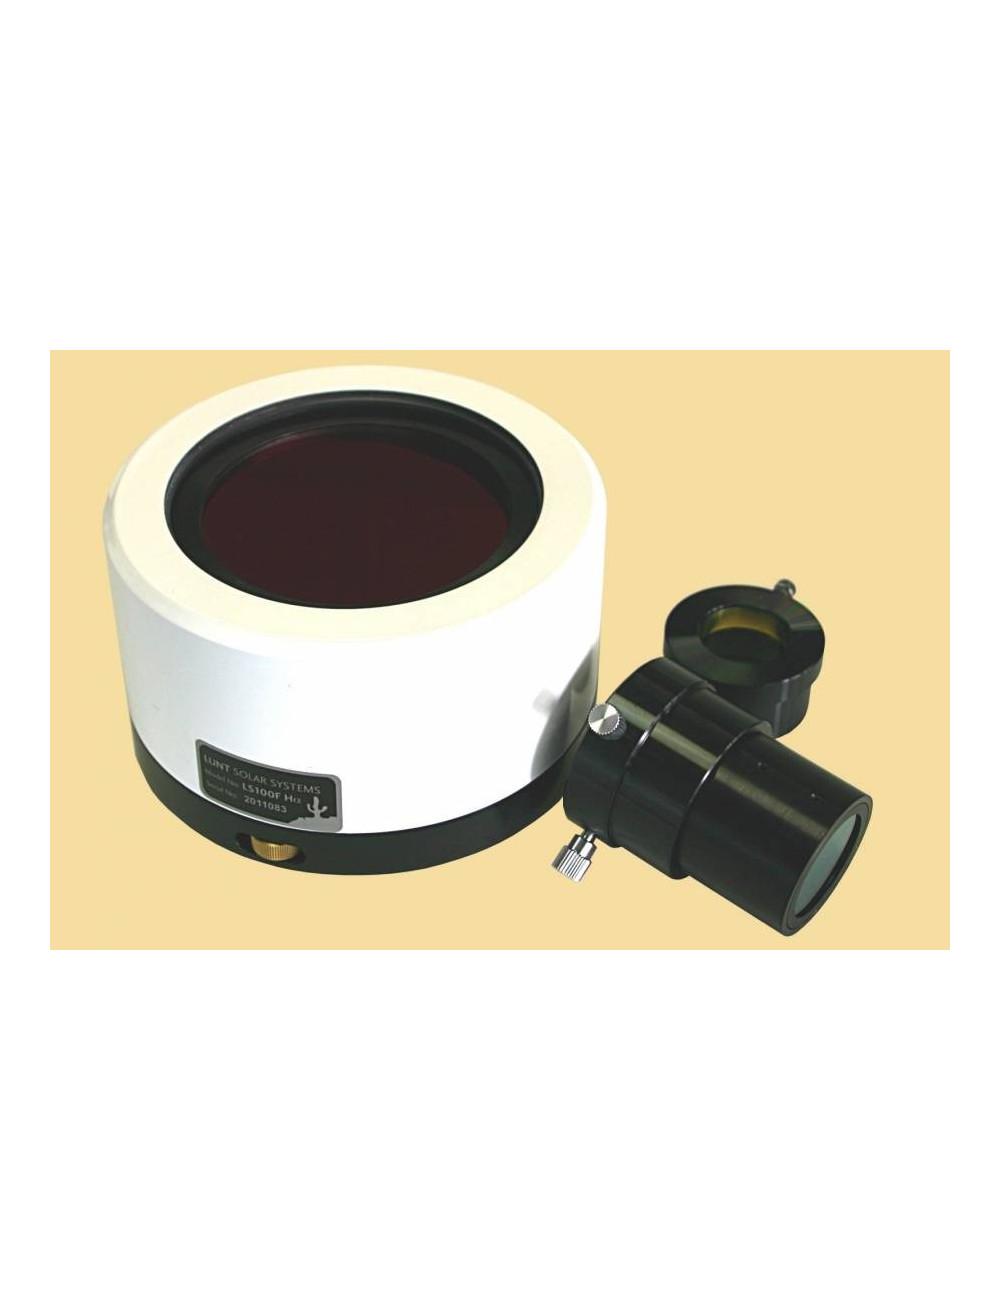 Filtre solaire H-alpha LUNT LS100FHa/B3400